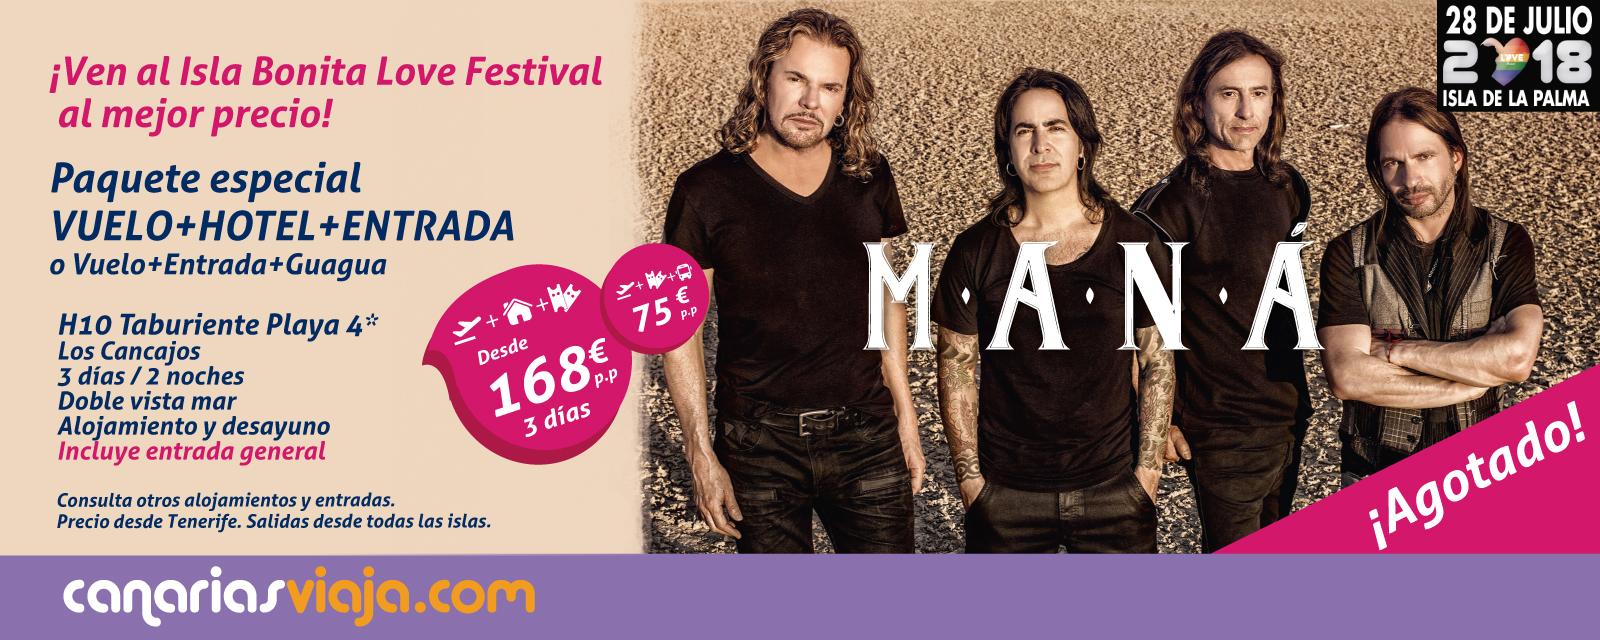 Love-festival-2018-web2